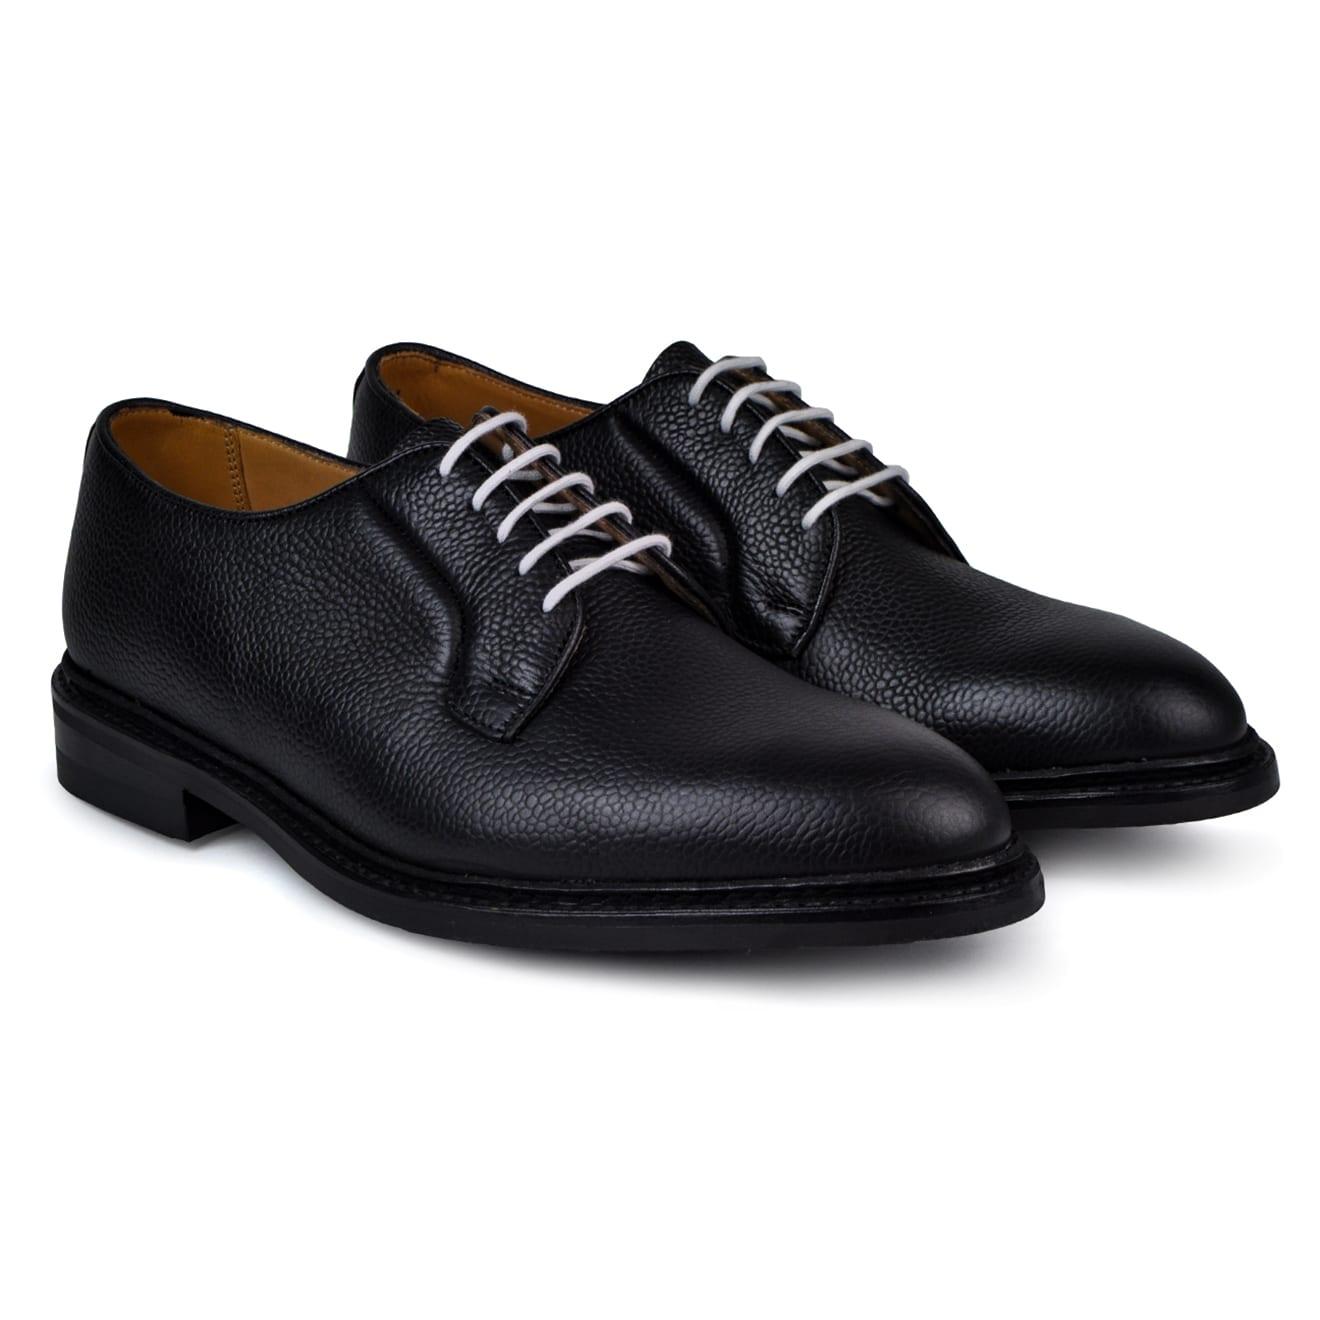 Fenwick Shoes Sale